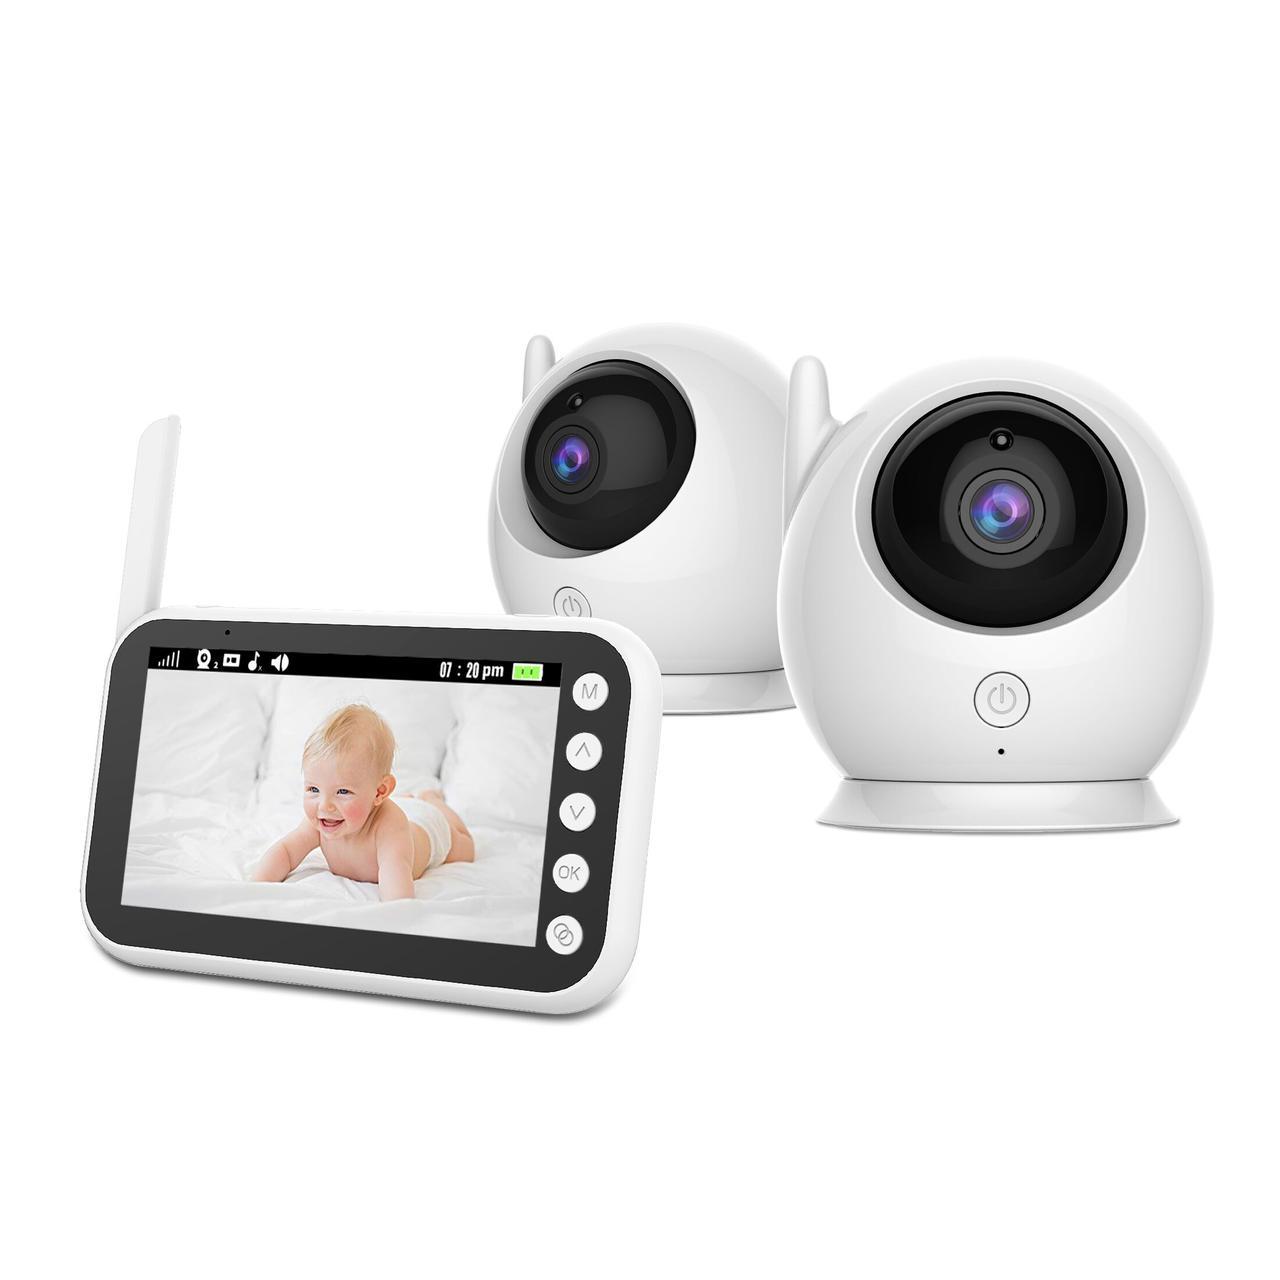 Видеоняня Baby Boom 100 - 2 in 1, с двумя камерами комплекте и экраном 4,3 дюйма